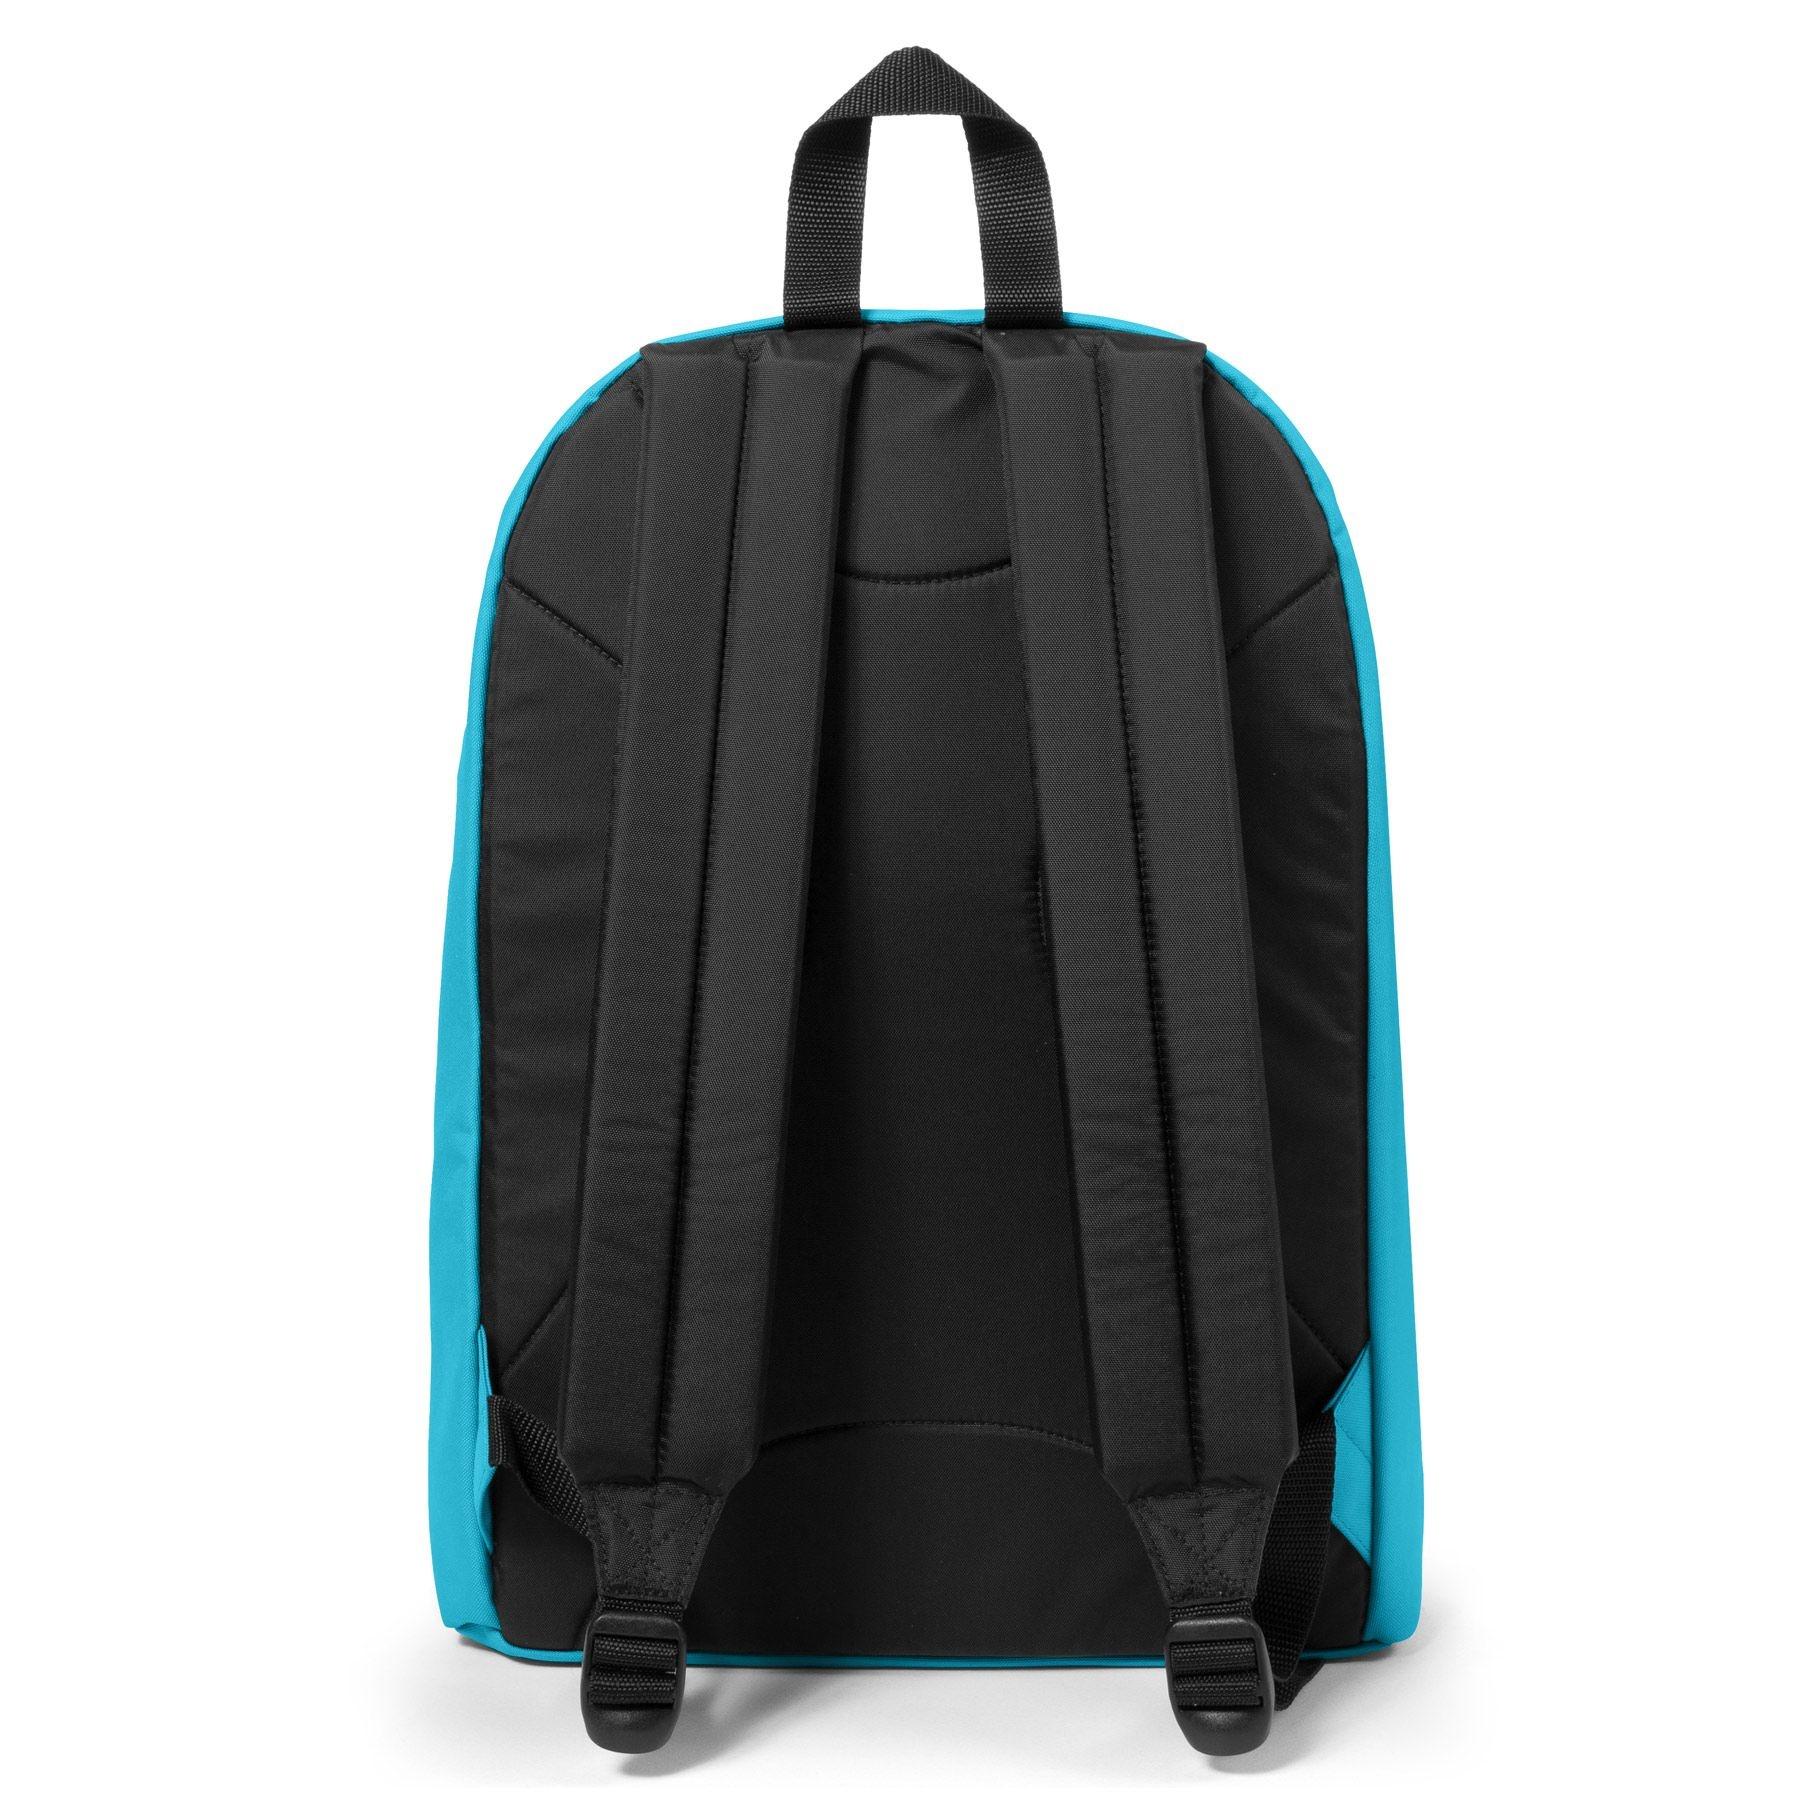 Eastpak Eastpak Out Of Office Pool Blue 15 inch laptop rugtas